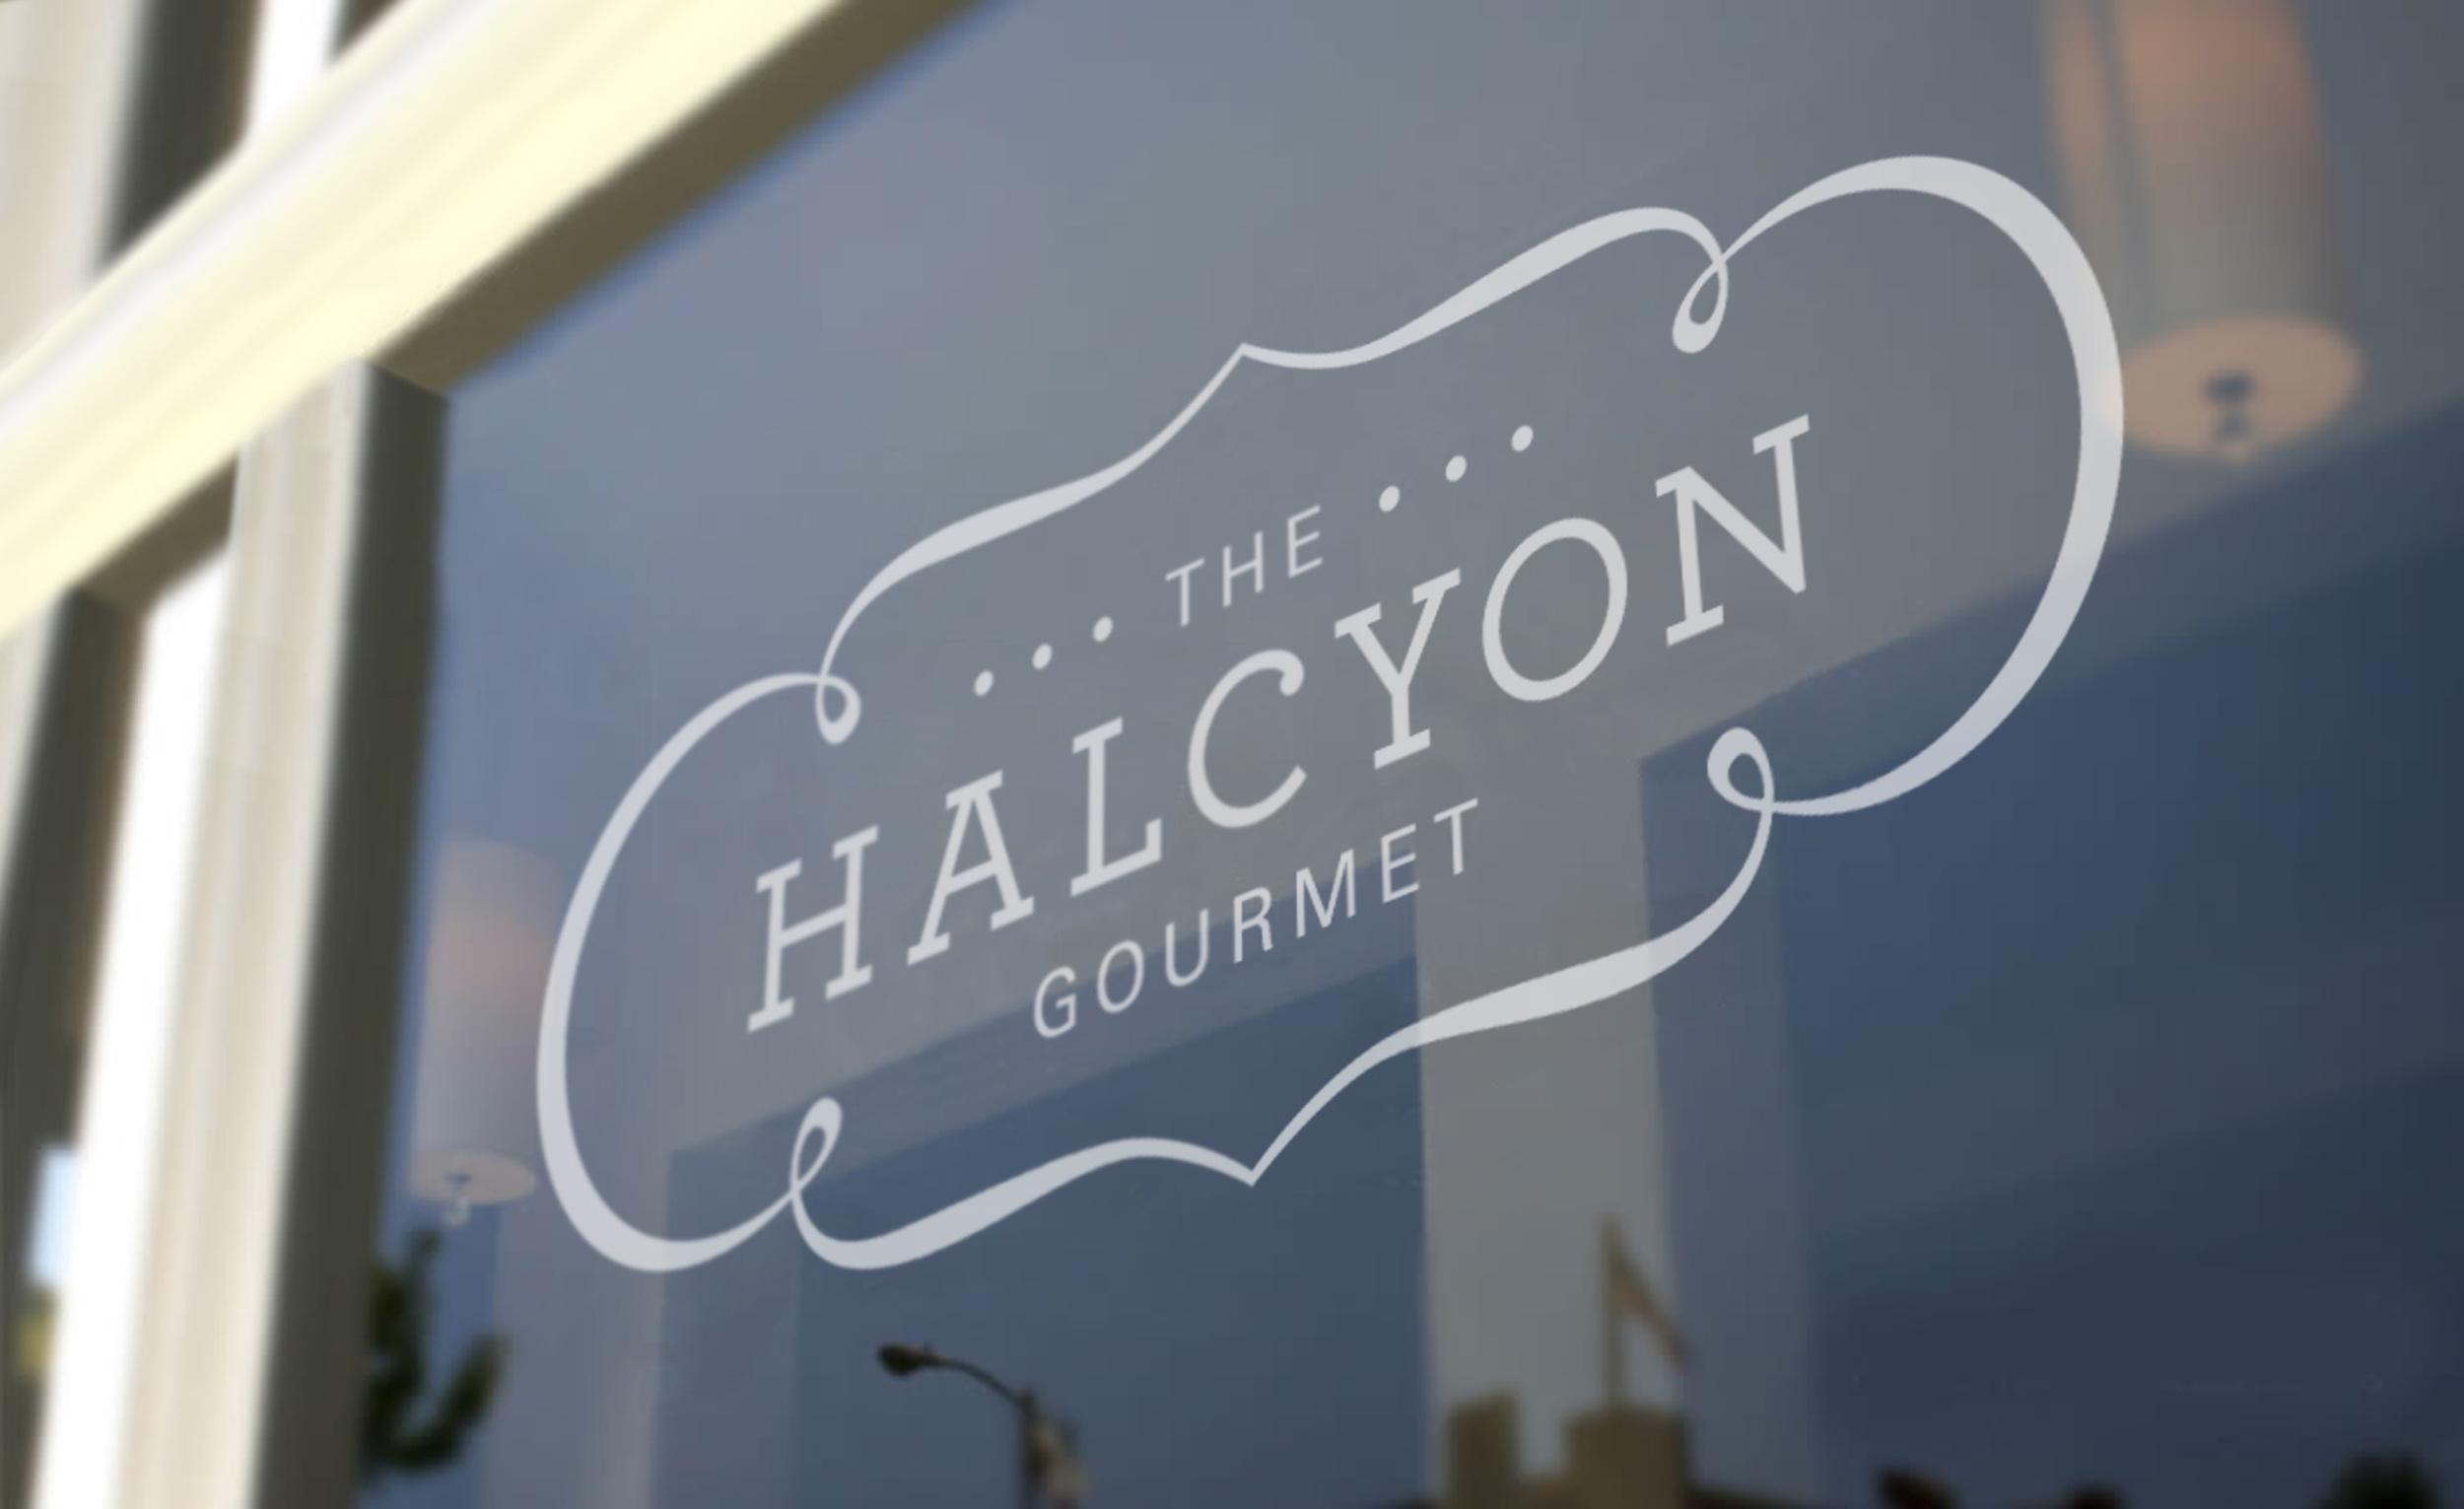 Halcyon_03_Window.jpg